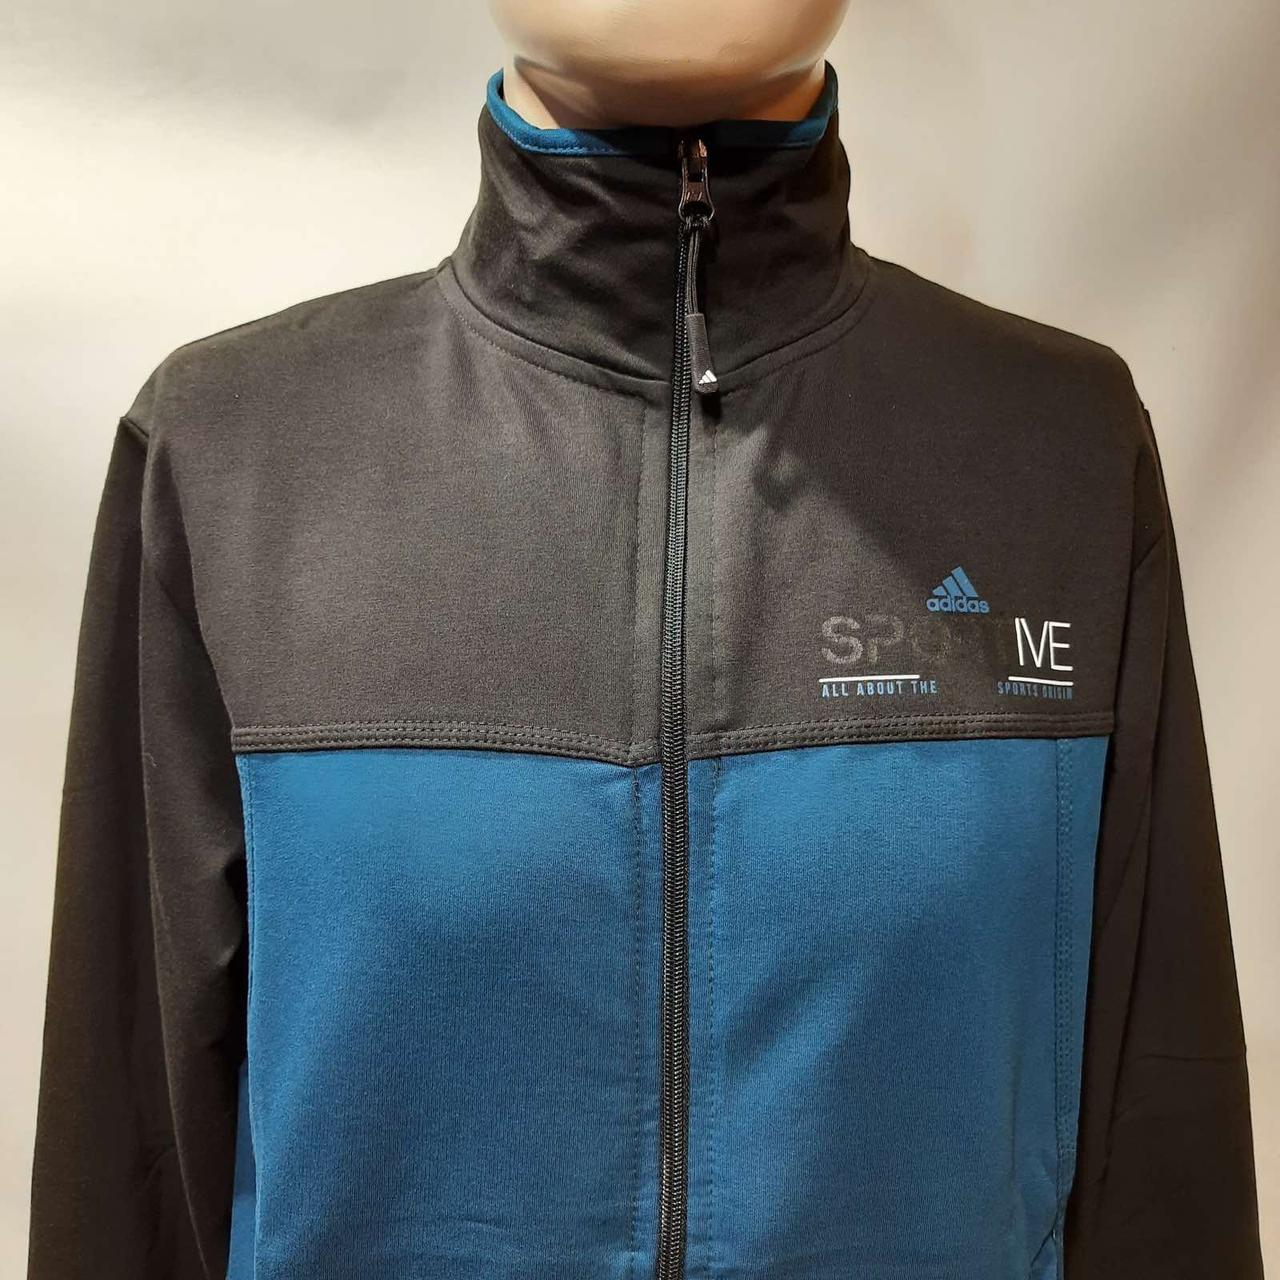 Мужская спортивная кофта на молнии трикотаж Турция M,L, 2XL Черно-синий